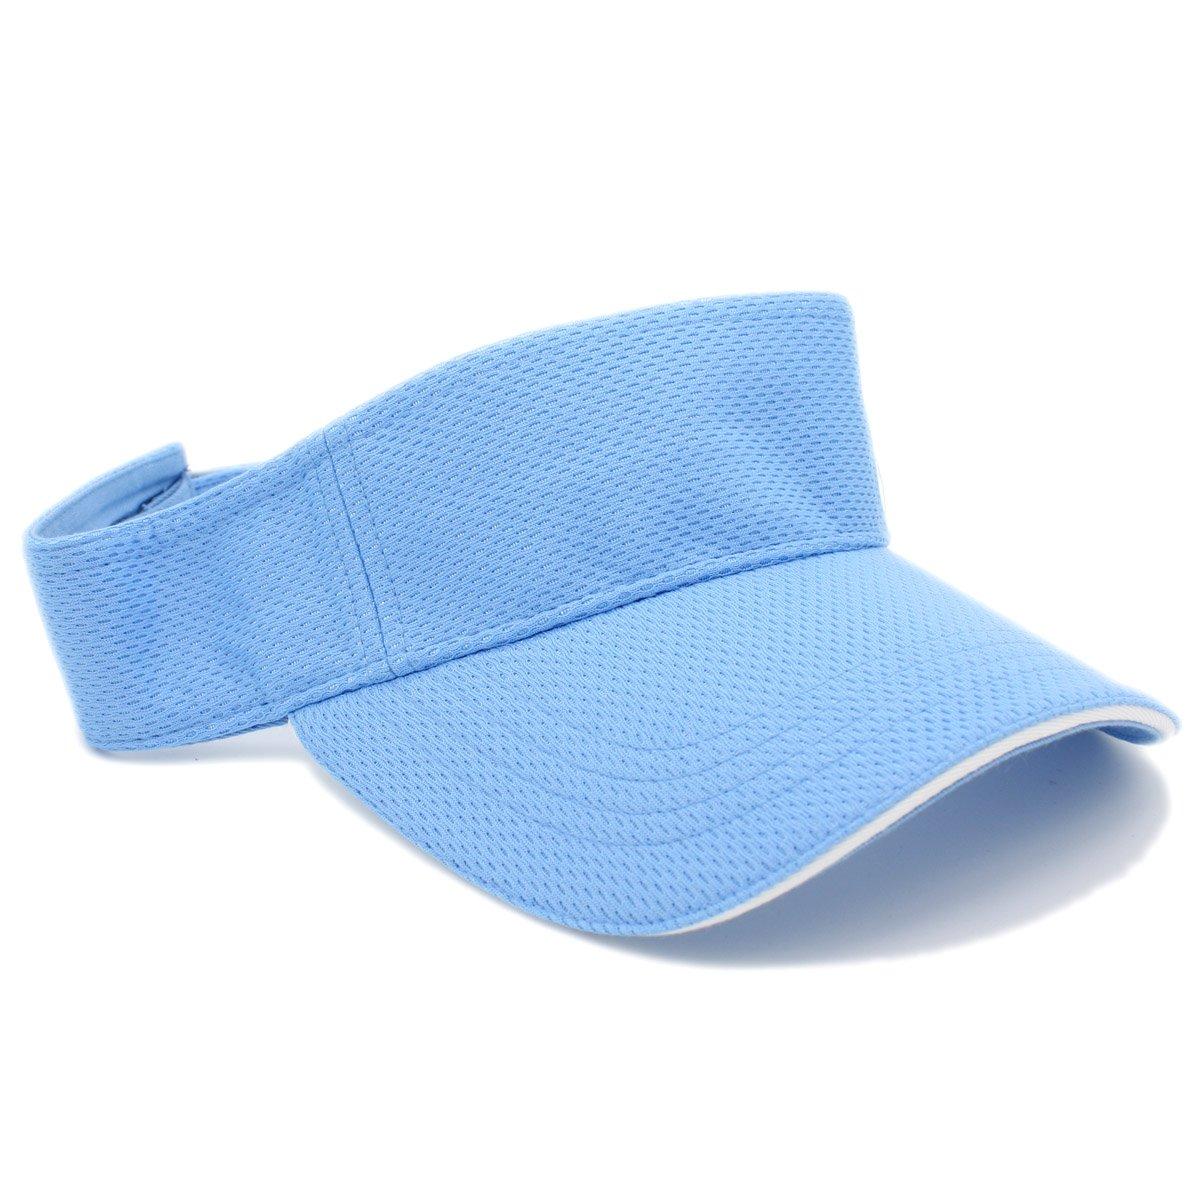 BLACK Quick Dry Hat Quick Dry Hat Moisture Management Out Door Sports Sun Visors